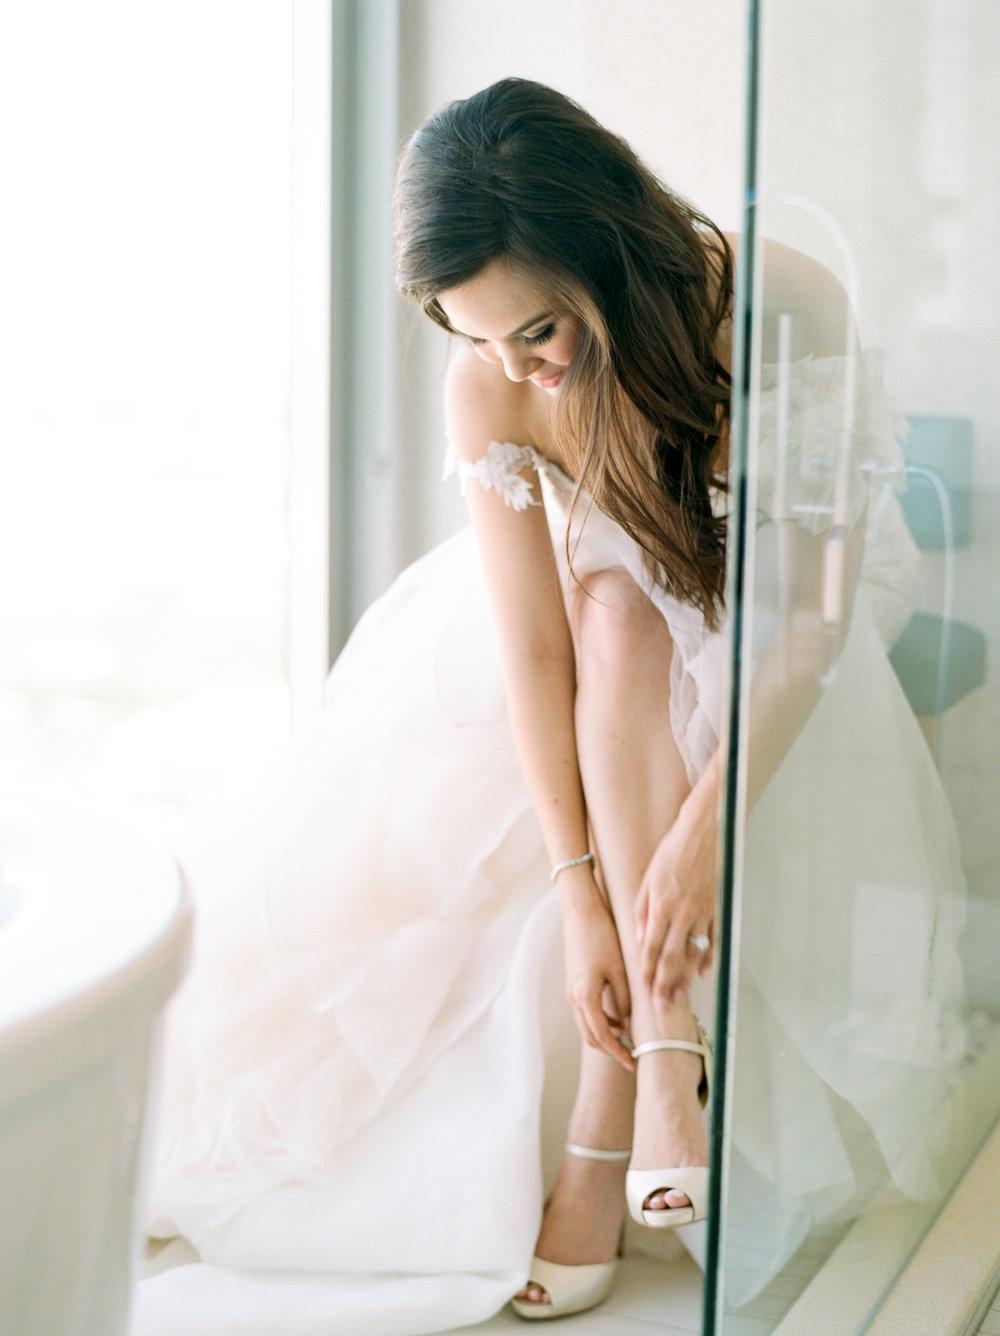 Martha-Stewart-Wedding-Dana-Fernandez-Photography-Josh-Texas-Film-Houston-Wedding-Fine-Art-Photographer-McGovern-Centennial-Gardens-Top-Best-6.jpg